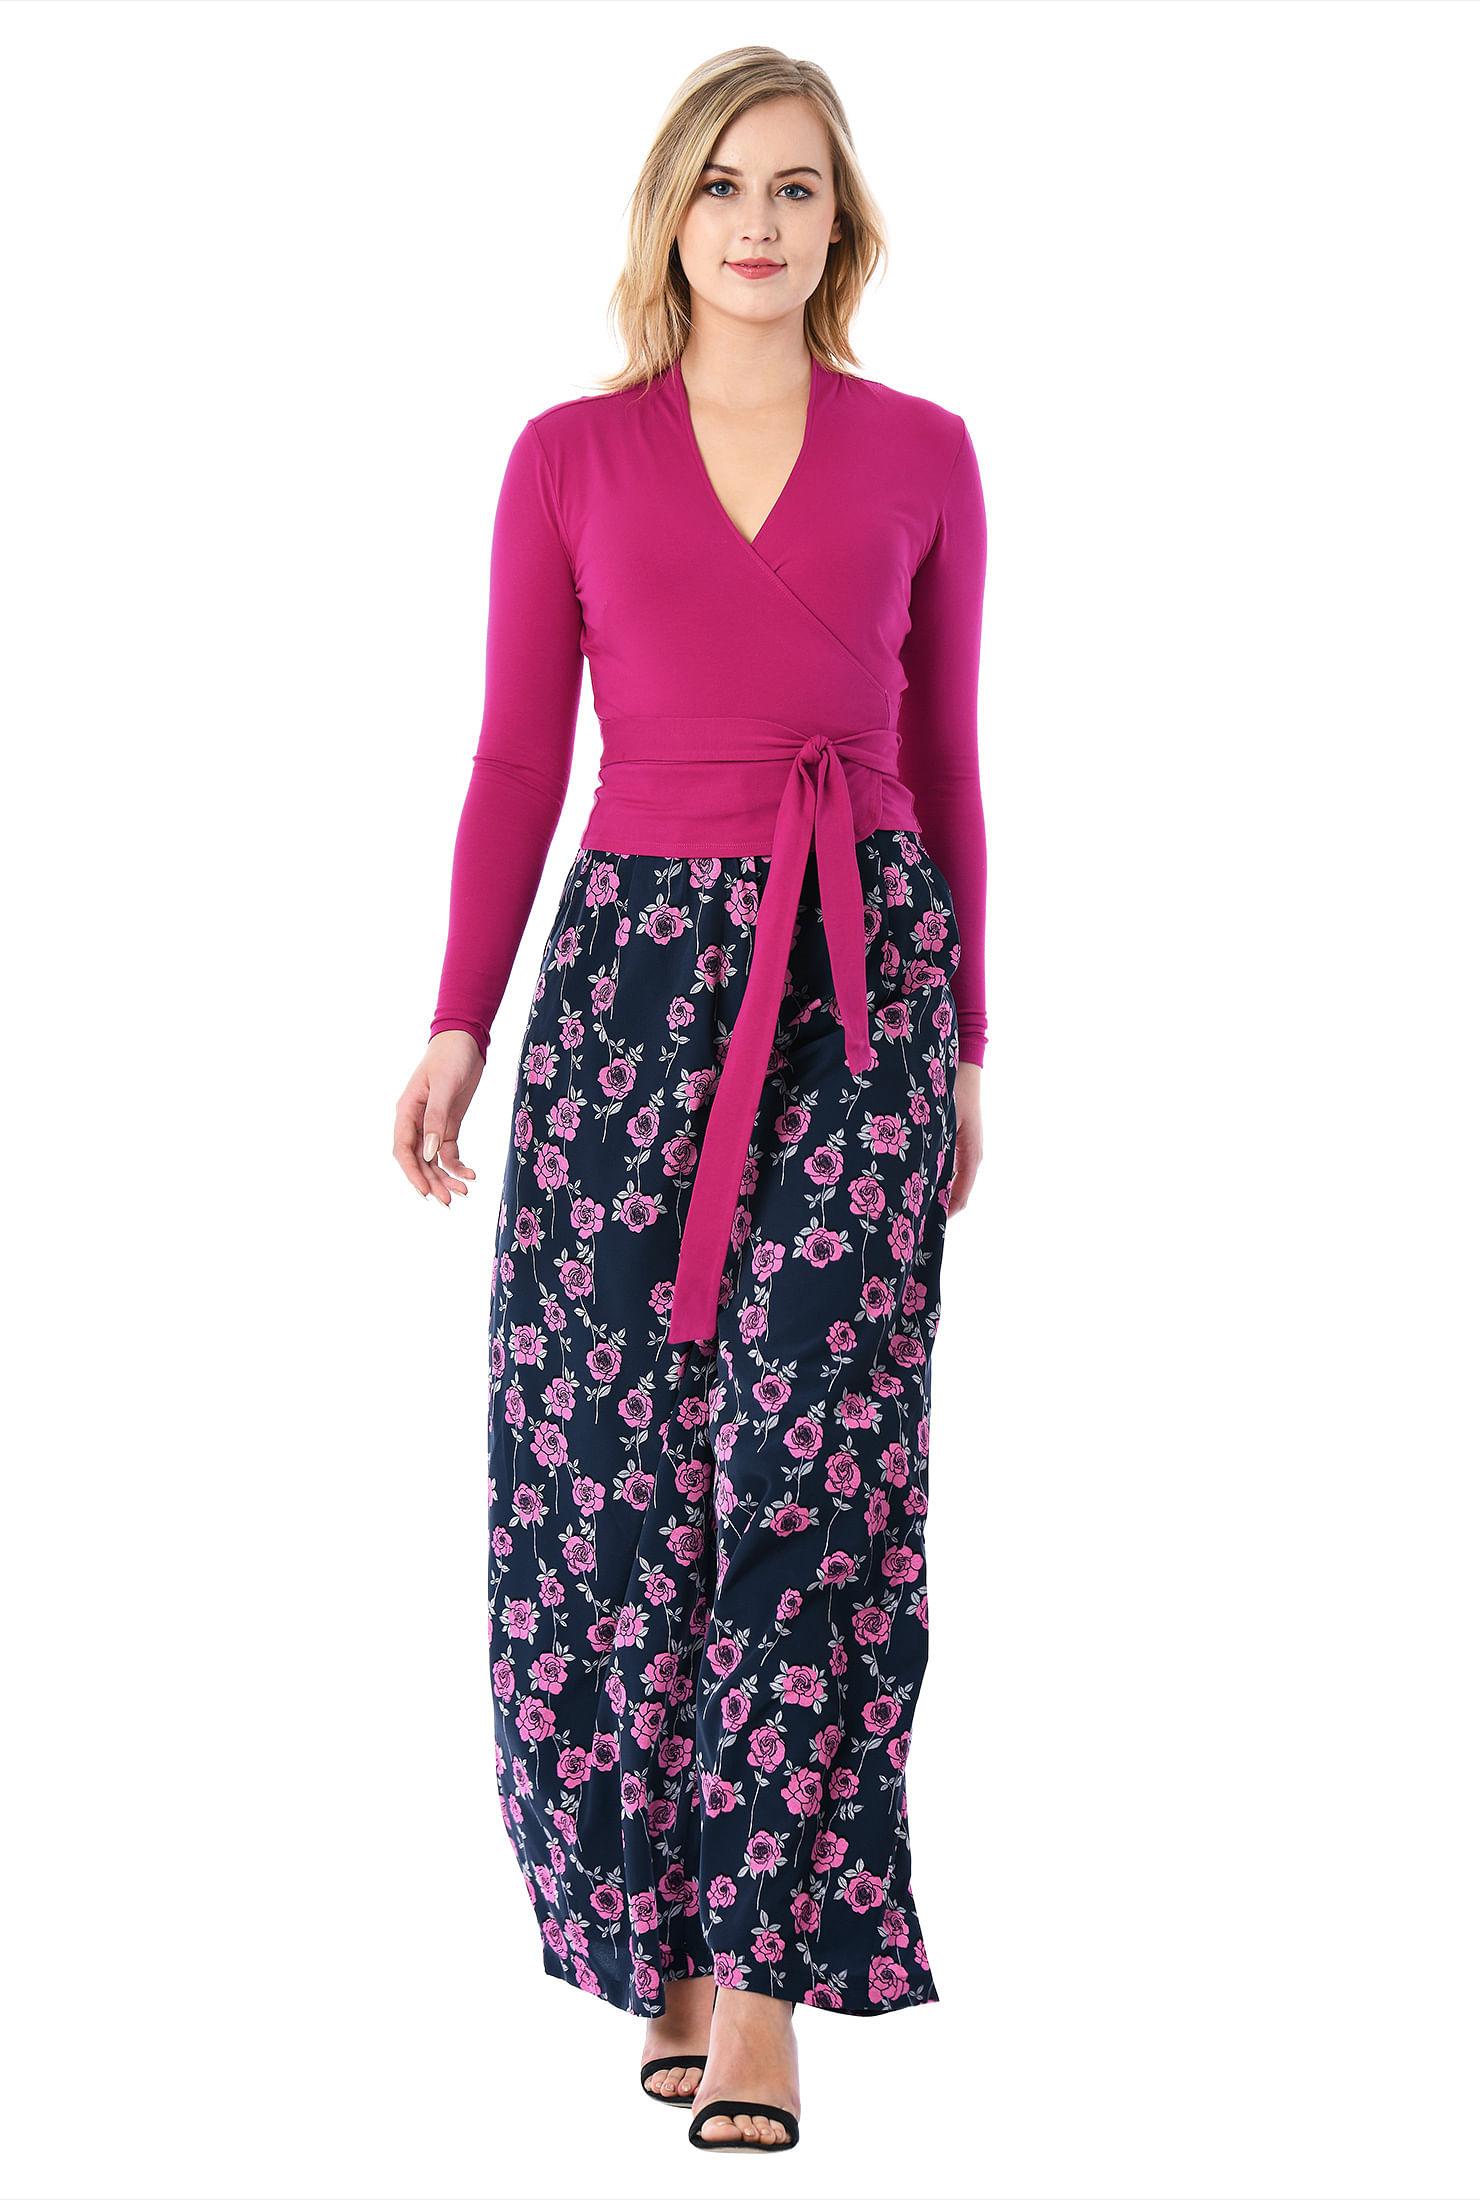 74cbd91840da1 Women's Fashion Clothing 0-36W and Custom